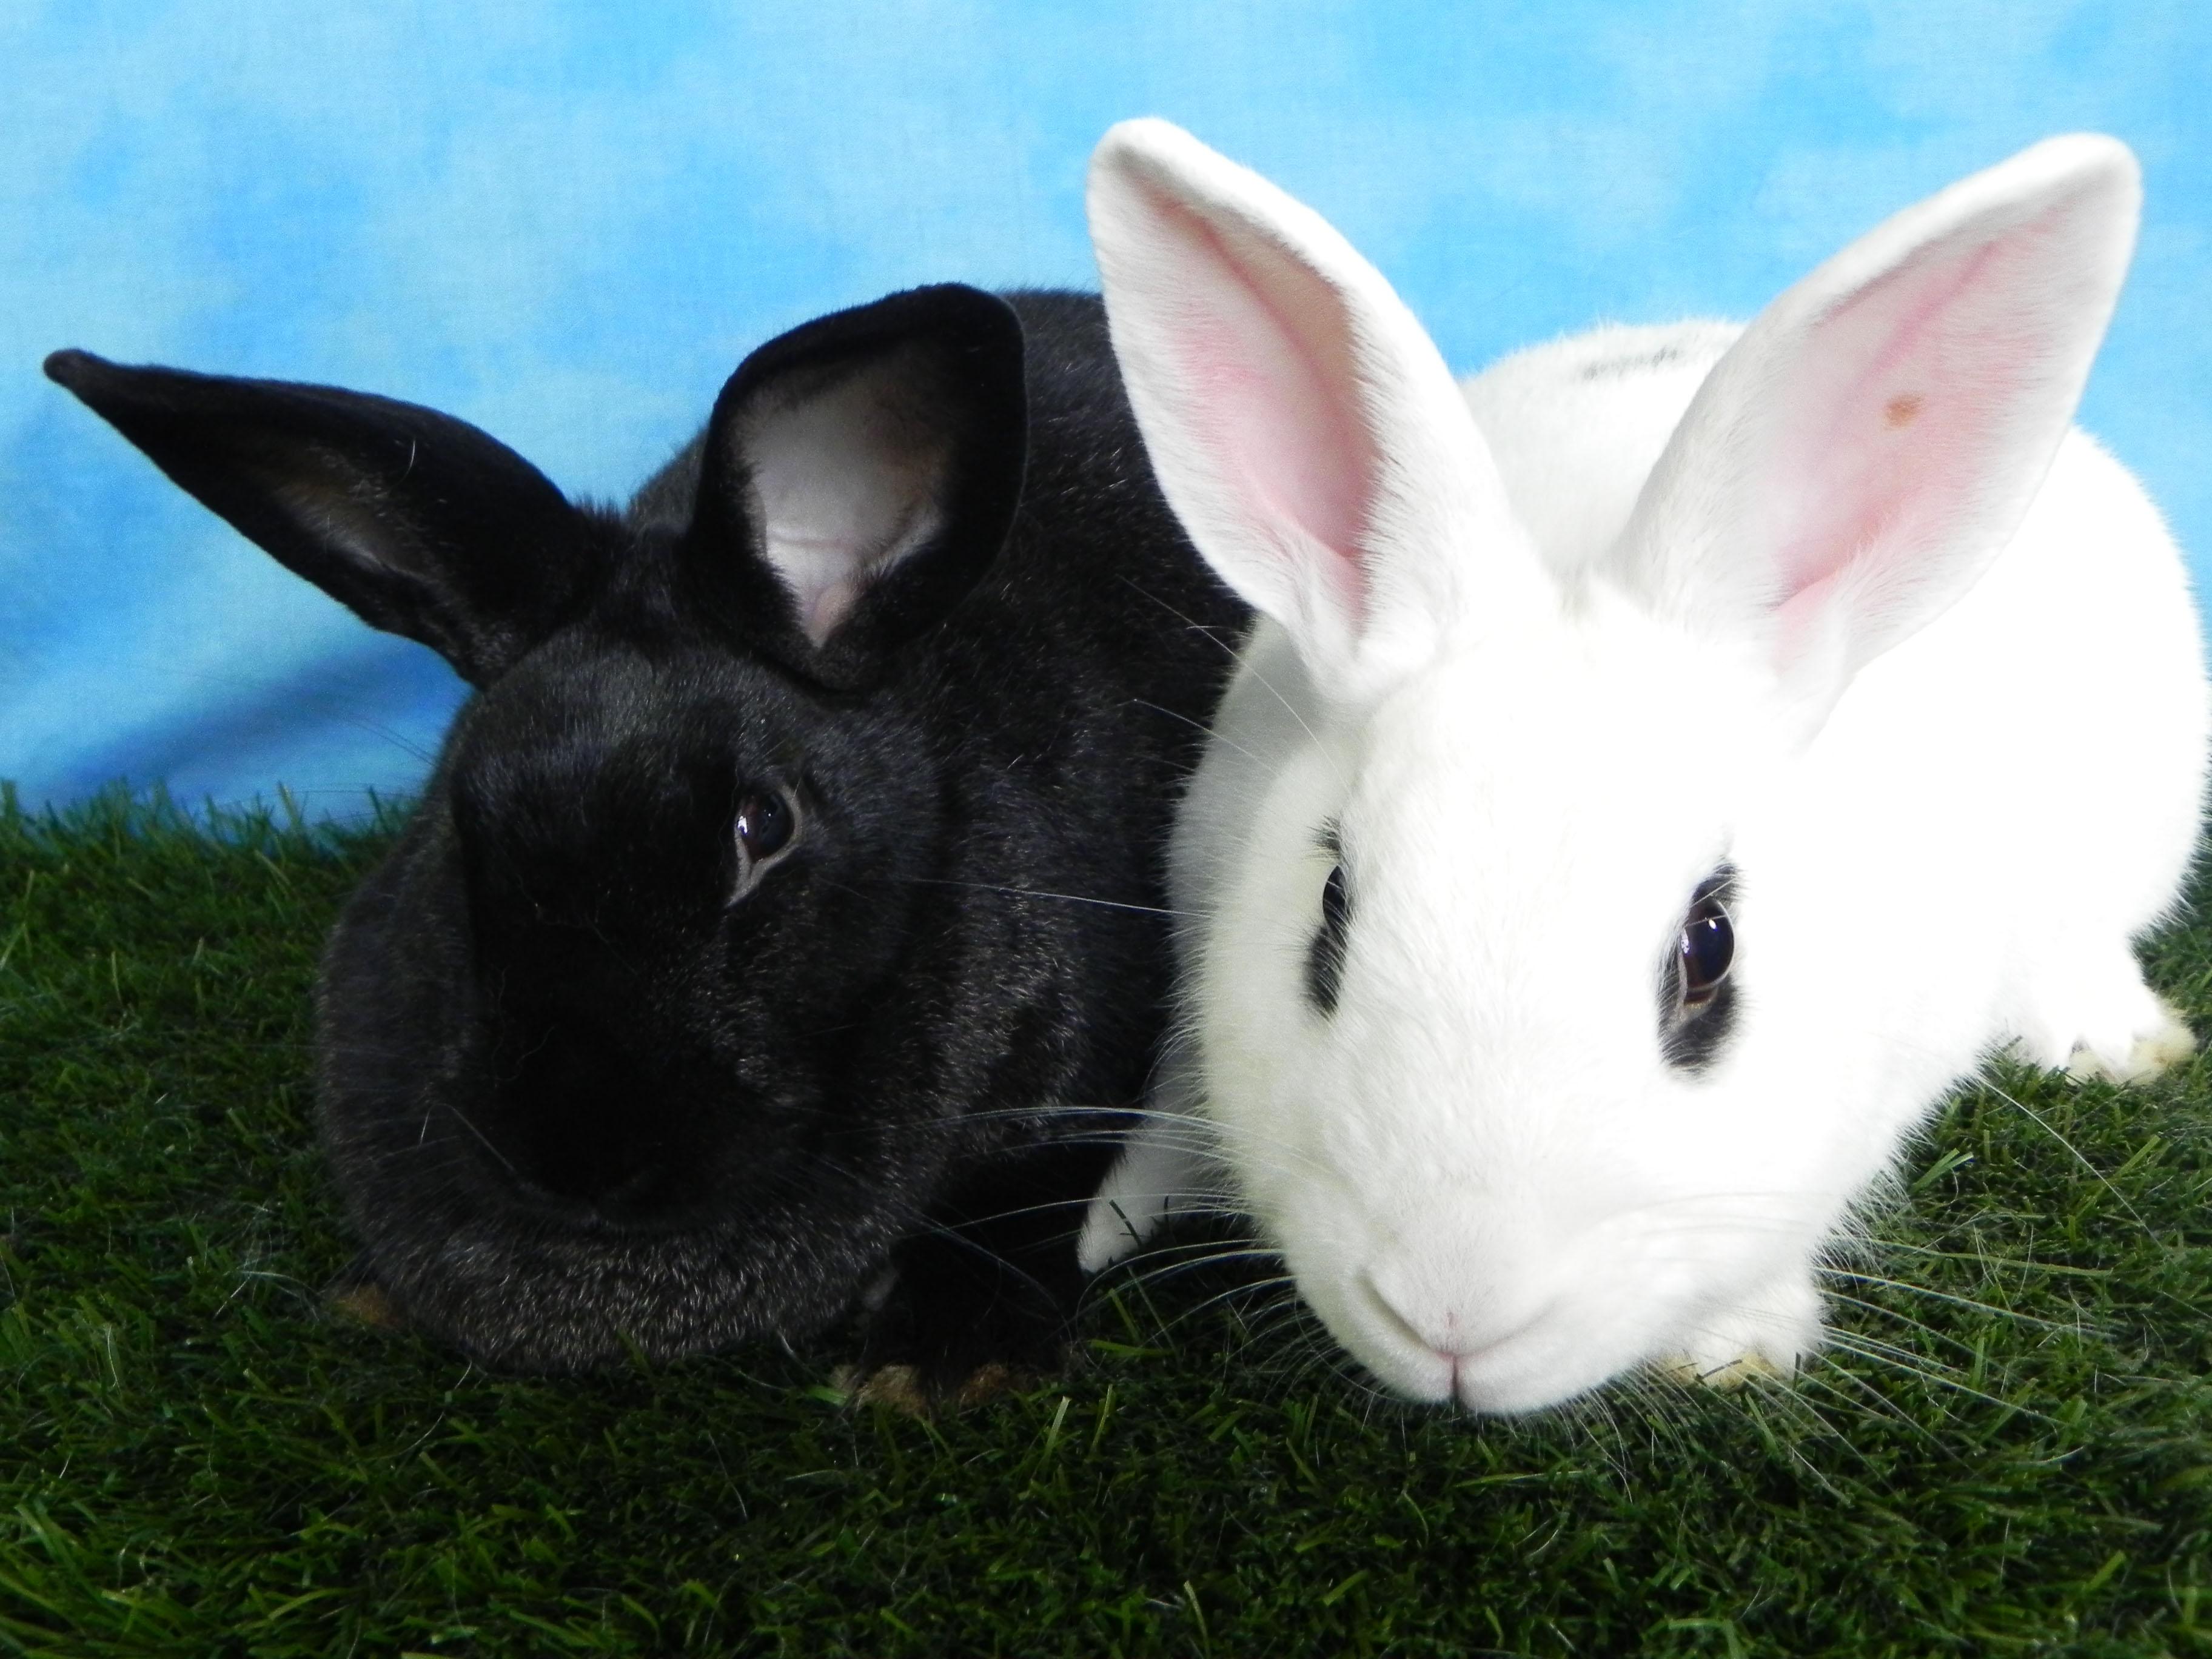 Casper and Chloe